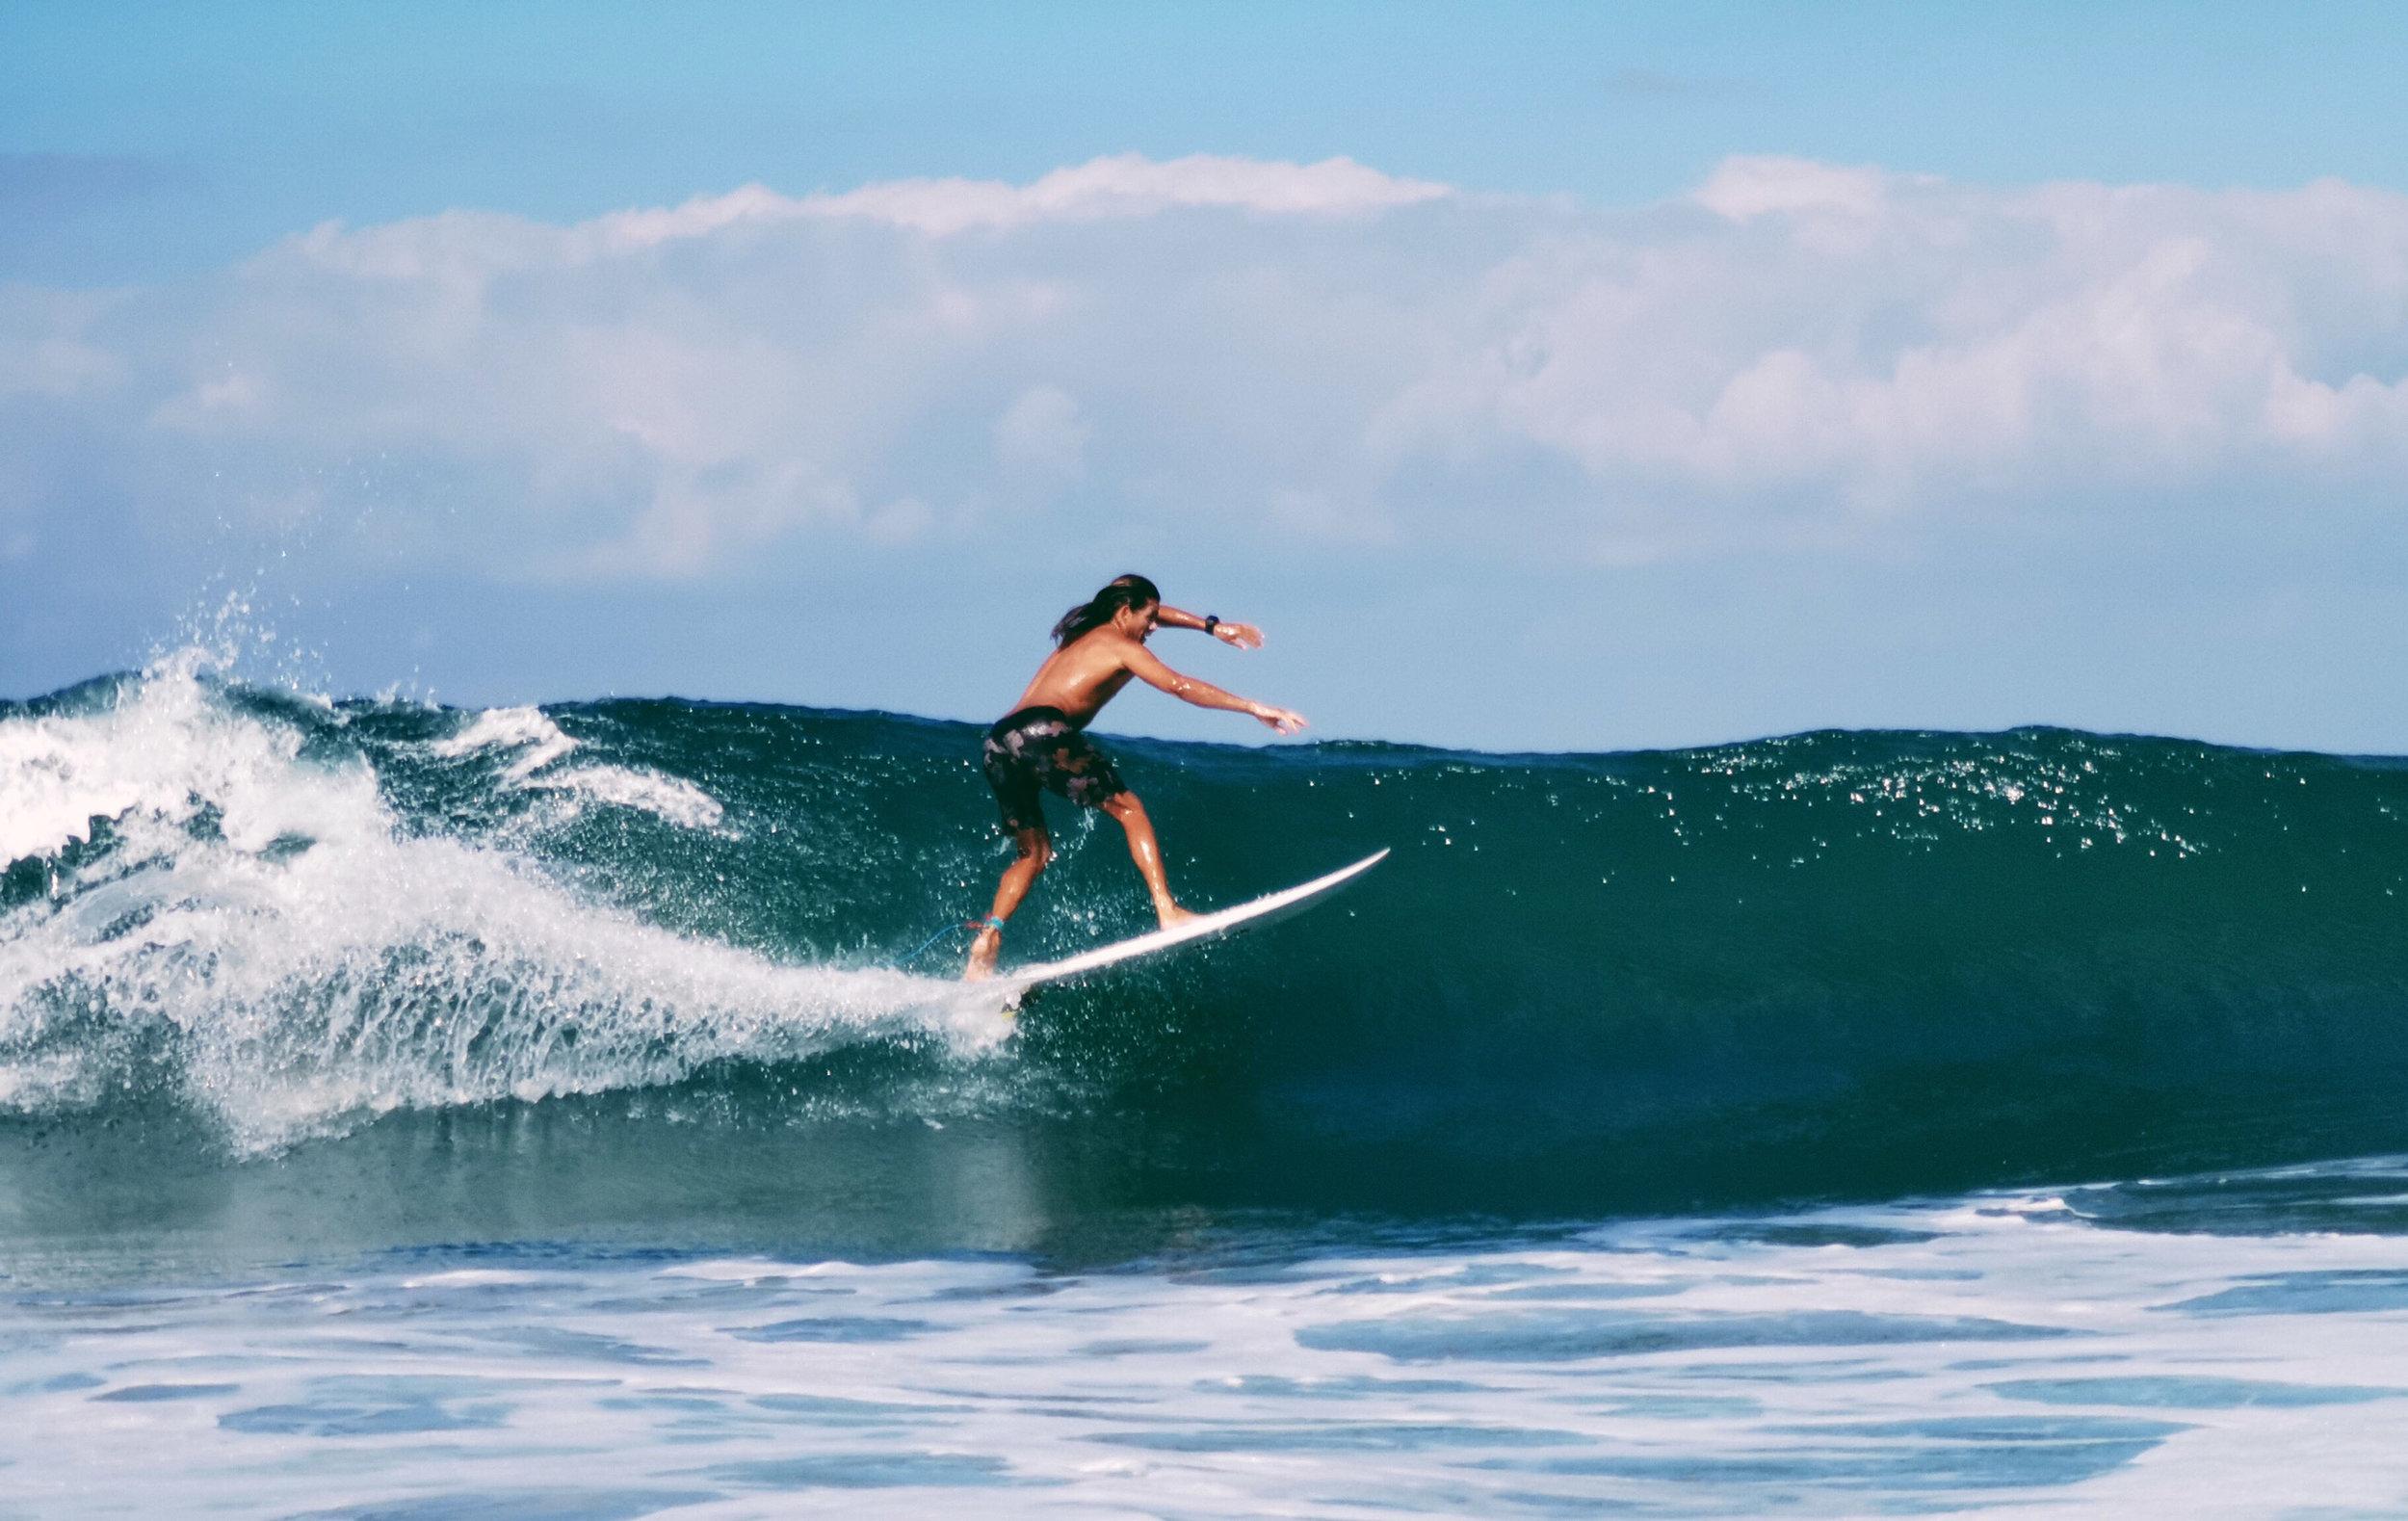 Huawei-Sayulita-Diego-Cadena-Kalle-Carranza-Isael-Preciado-Surf-Mexico-Heiko-Bothe-11.jpg